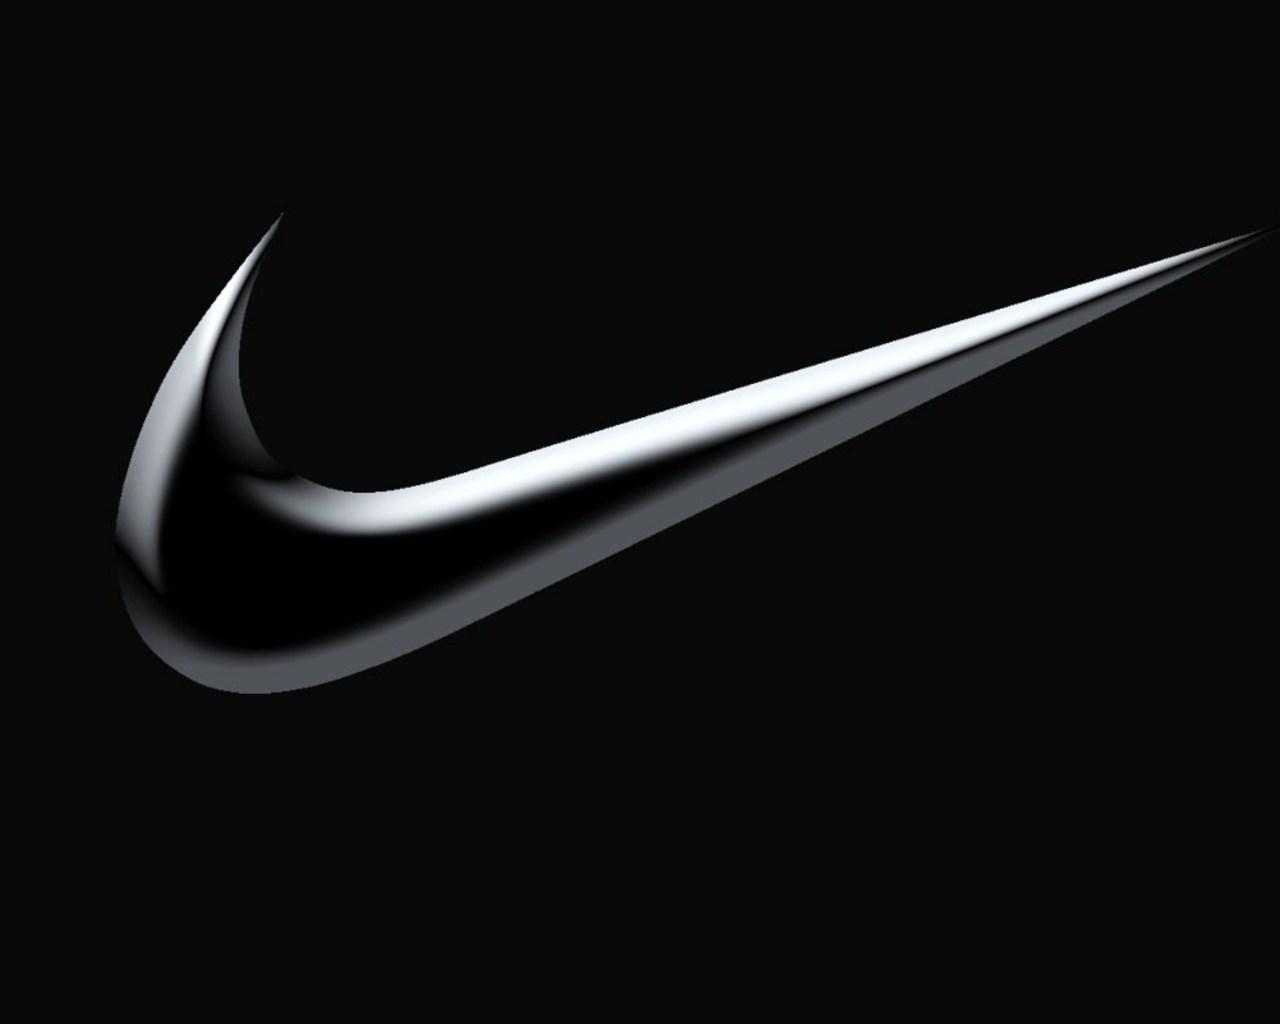 1280x1024px Lebron Nike Wallpaper Wallpapersafari